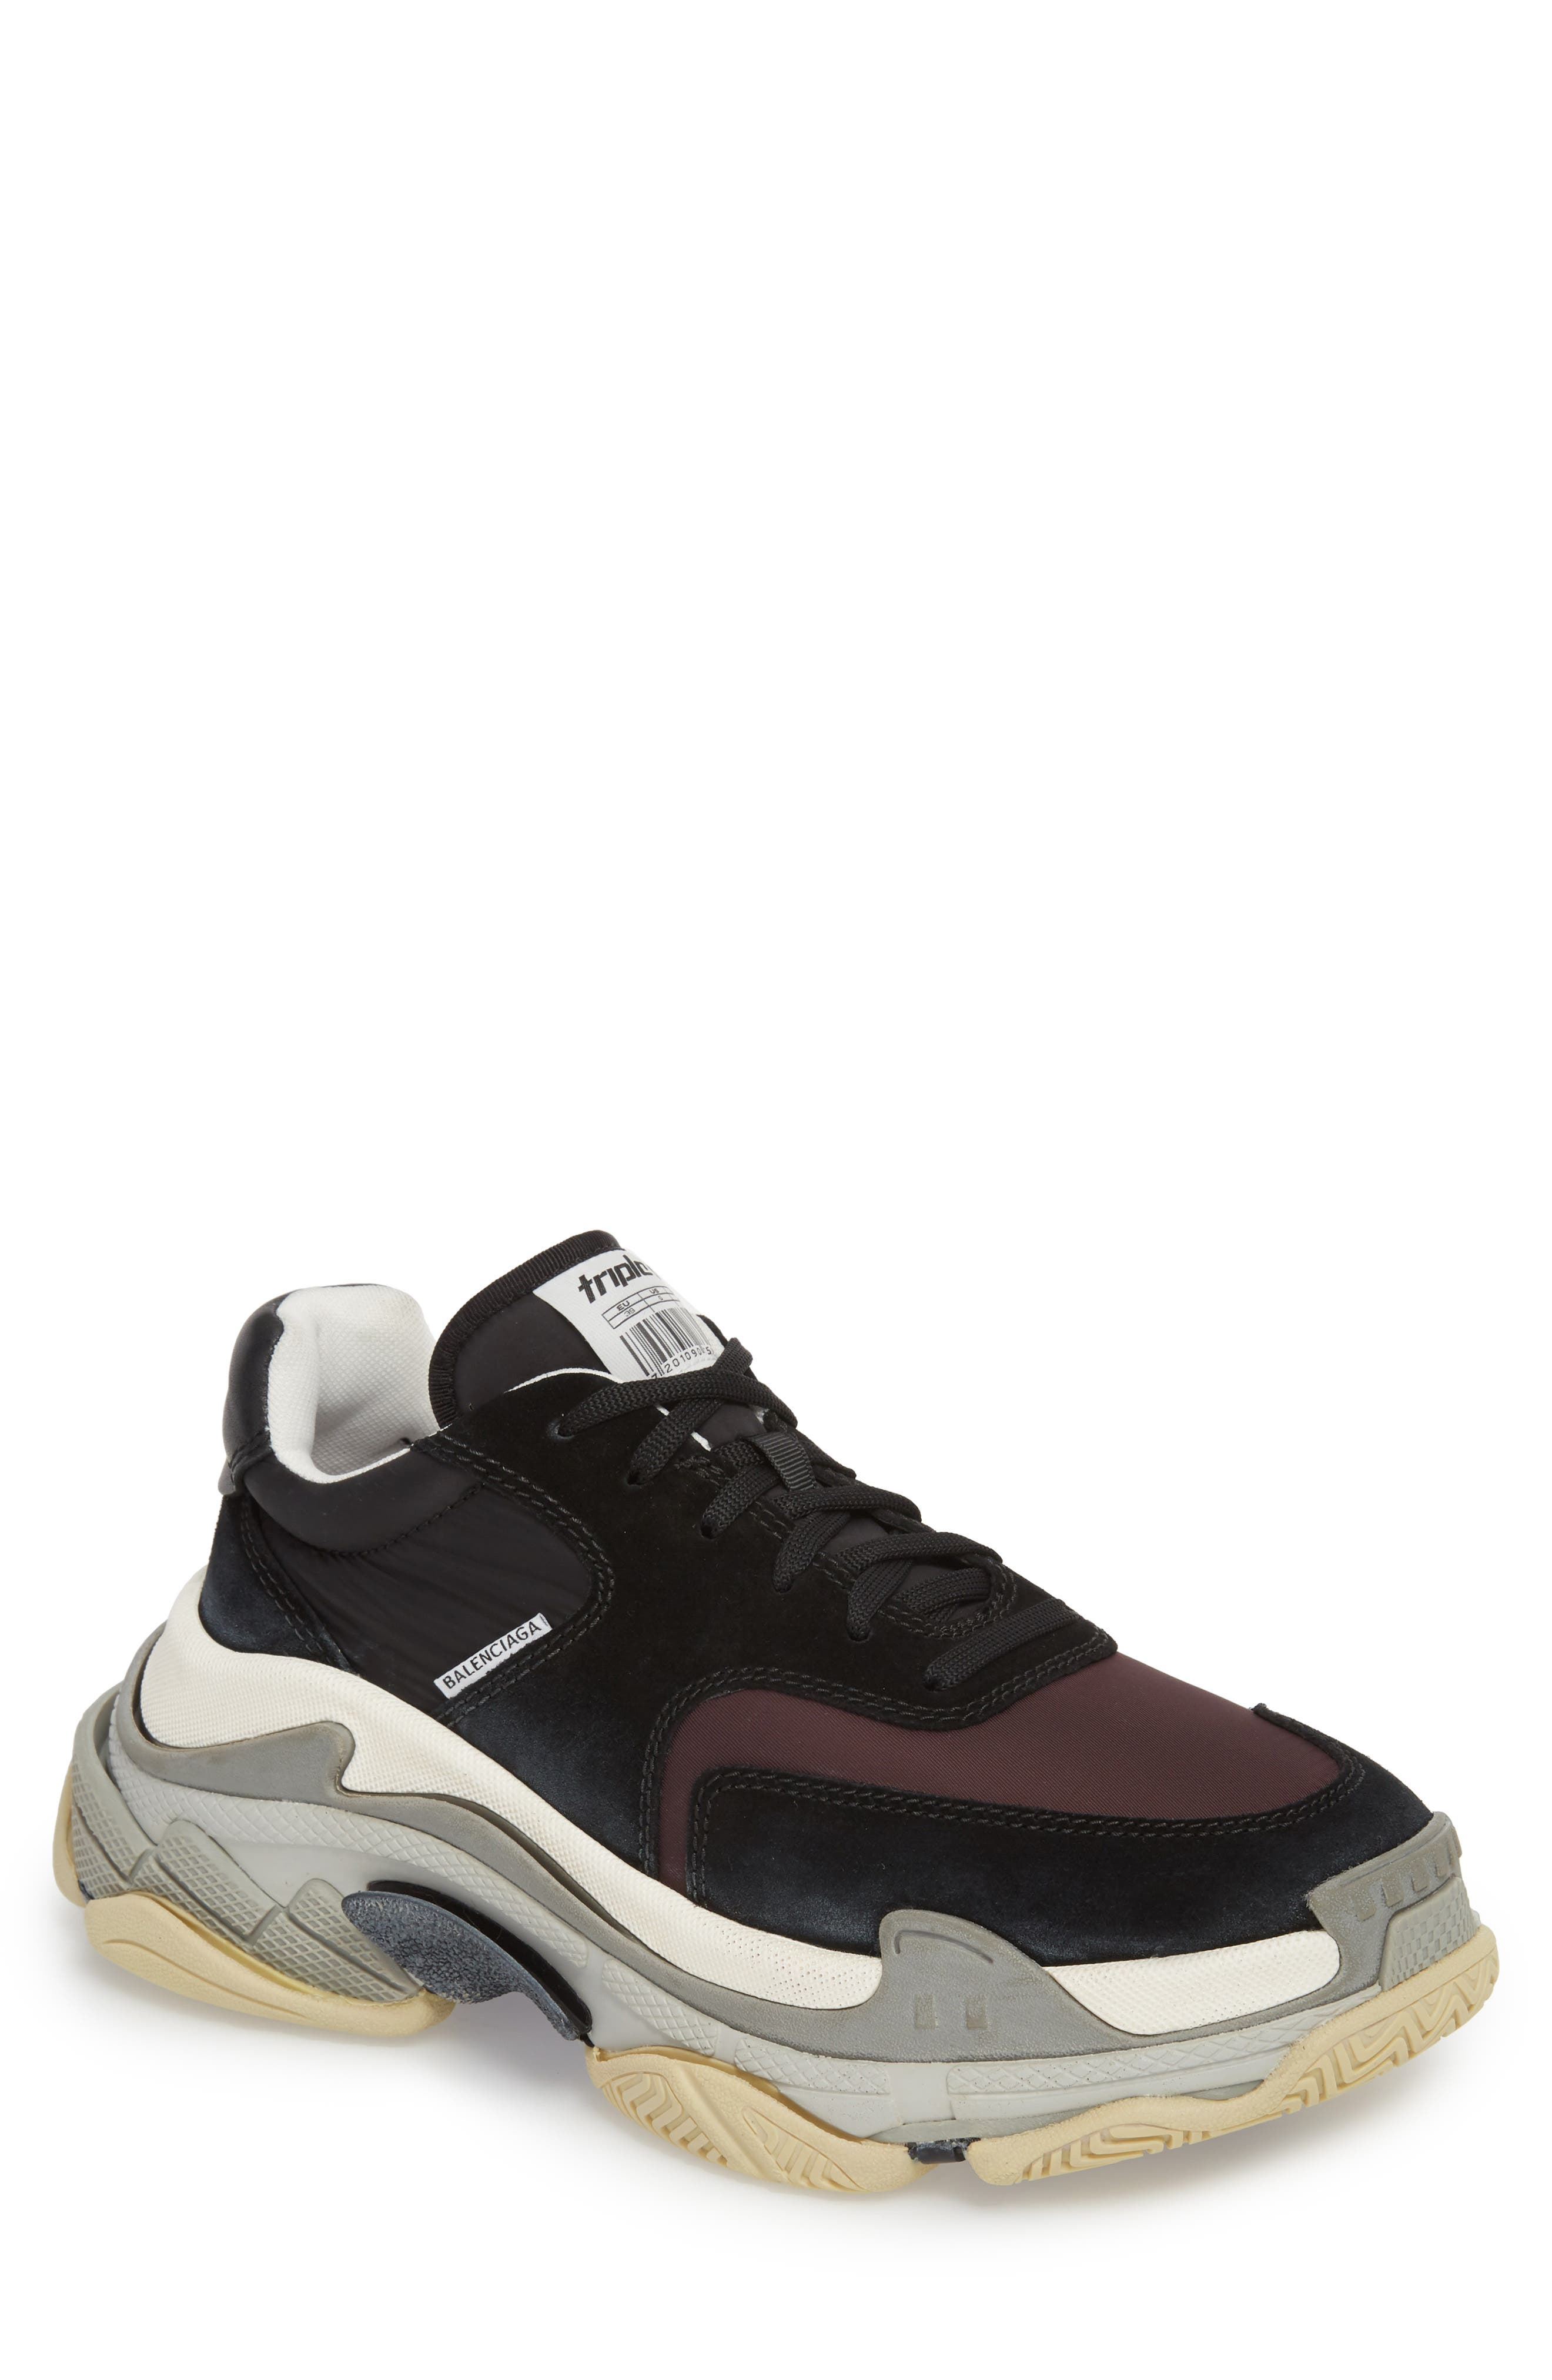 Triple S Retro Sneaker,                             Main thumbnail 1, color,                             Black/ Bordeaux